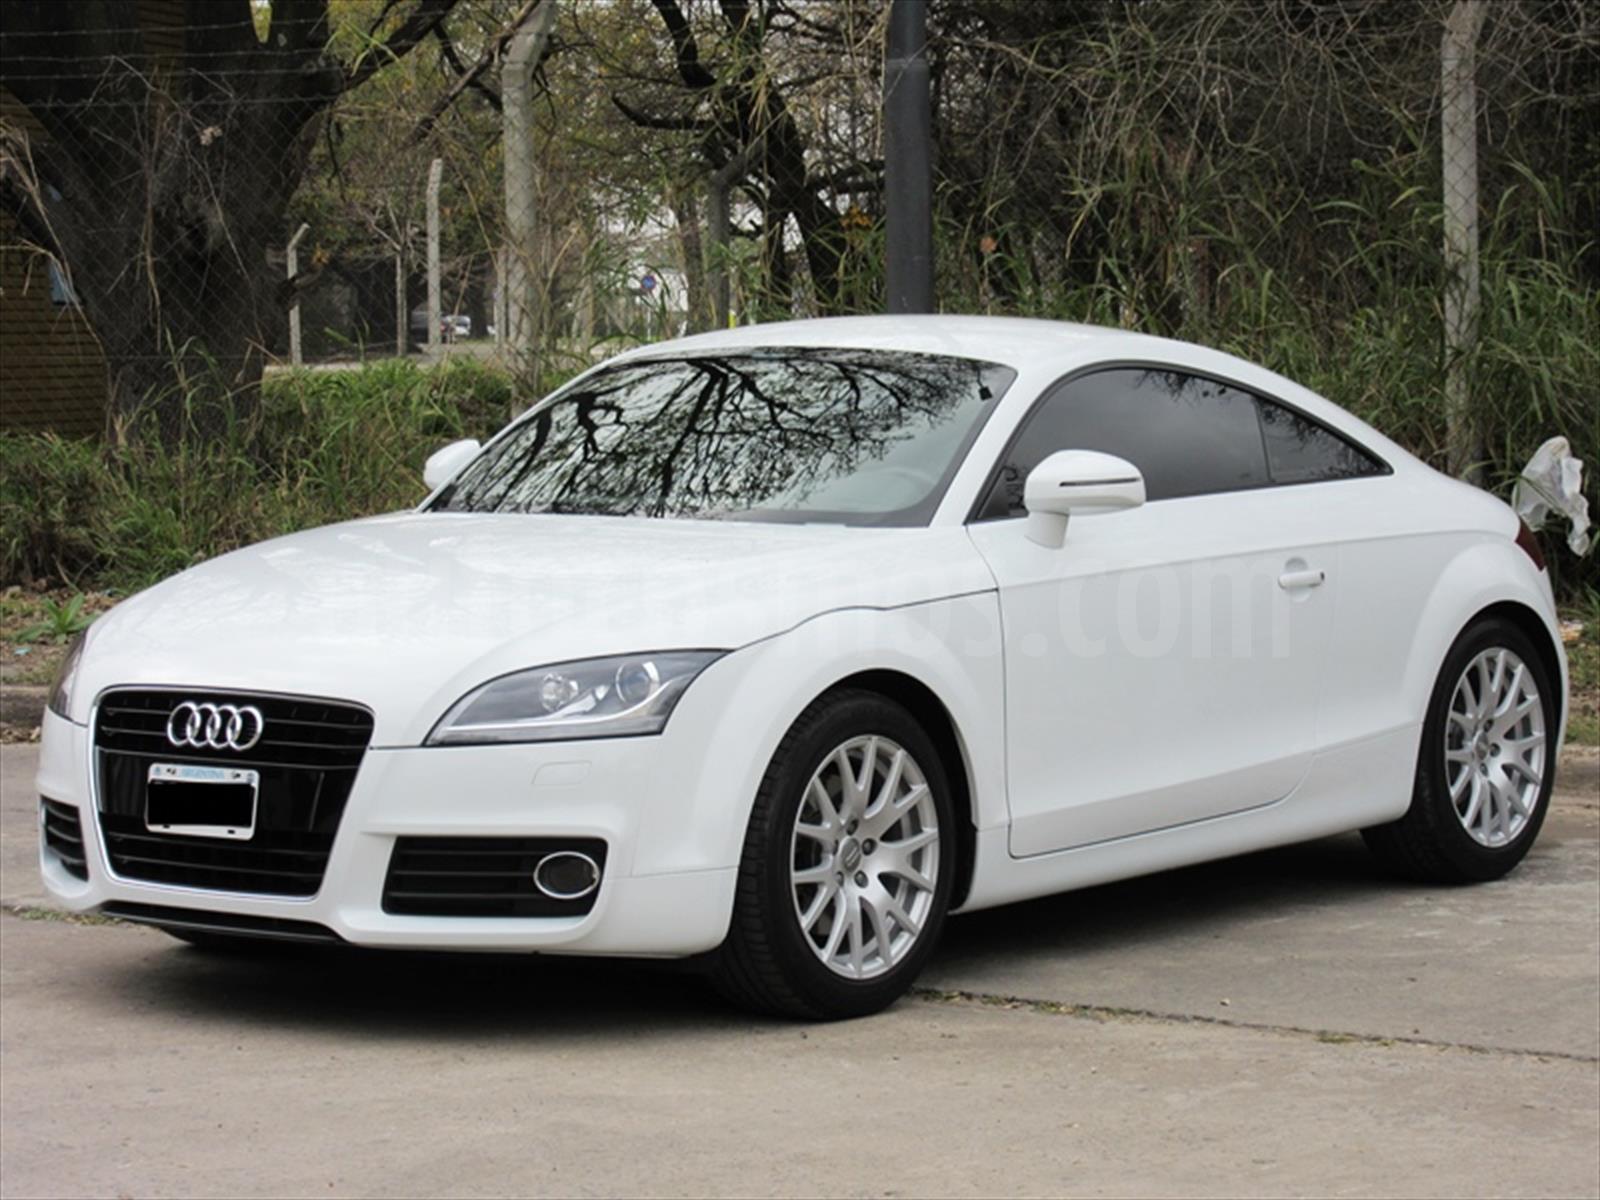 Venta Autos Usado Capital Federal Audi Tt Coupe 2 0 T